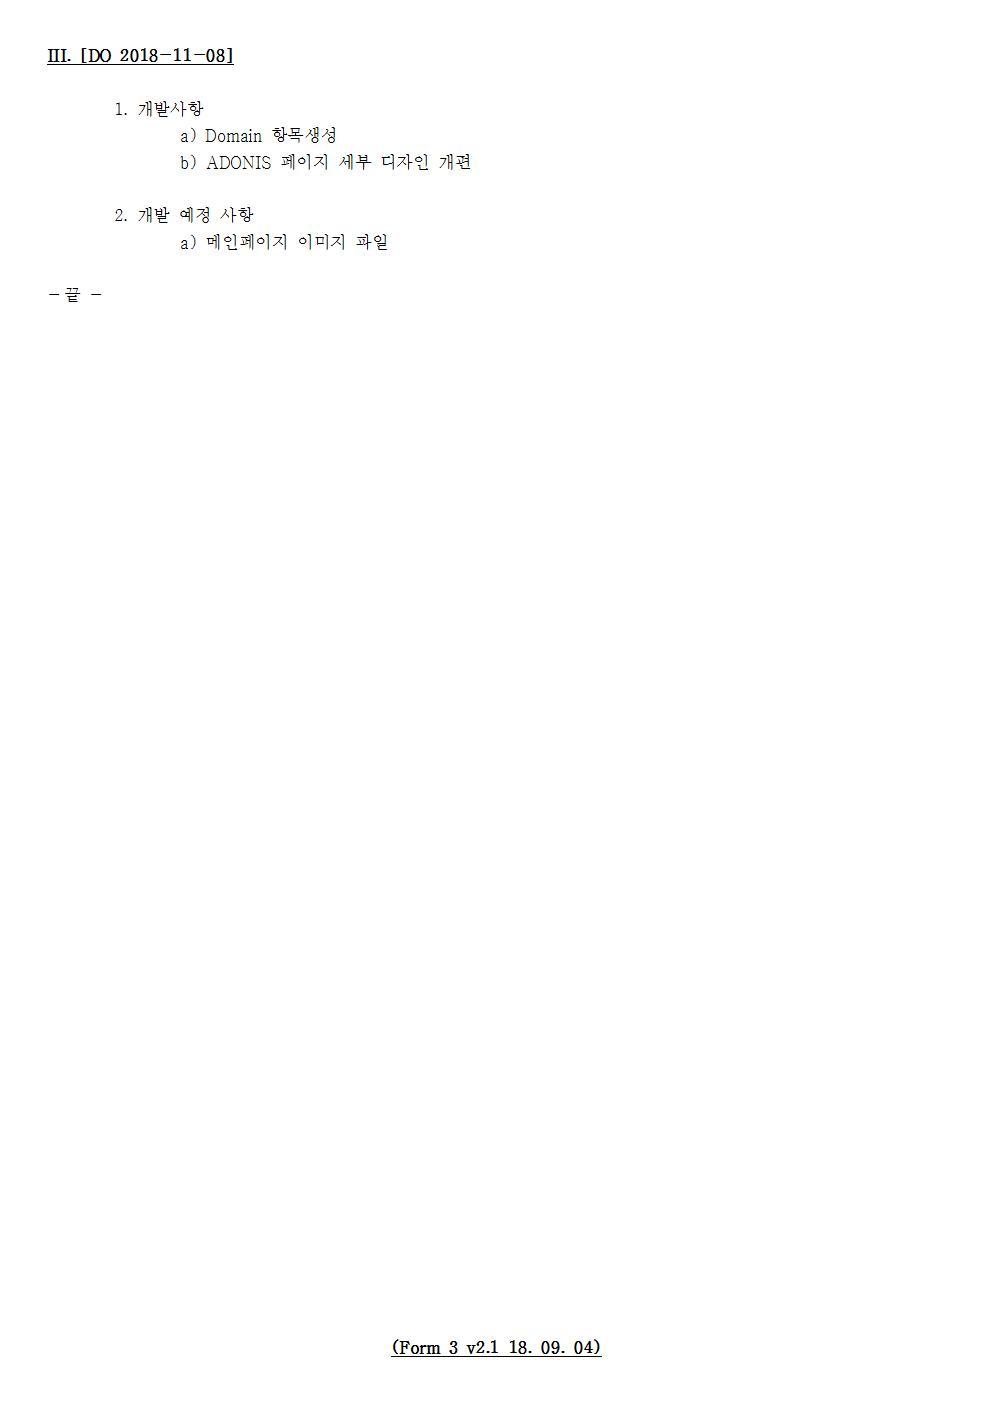 D-[18-047-BZ-07]-[BZEN HP v3.0]-[2018-11-08][HH]003.jpg